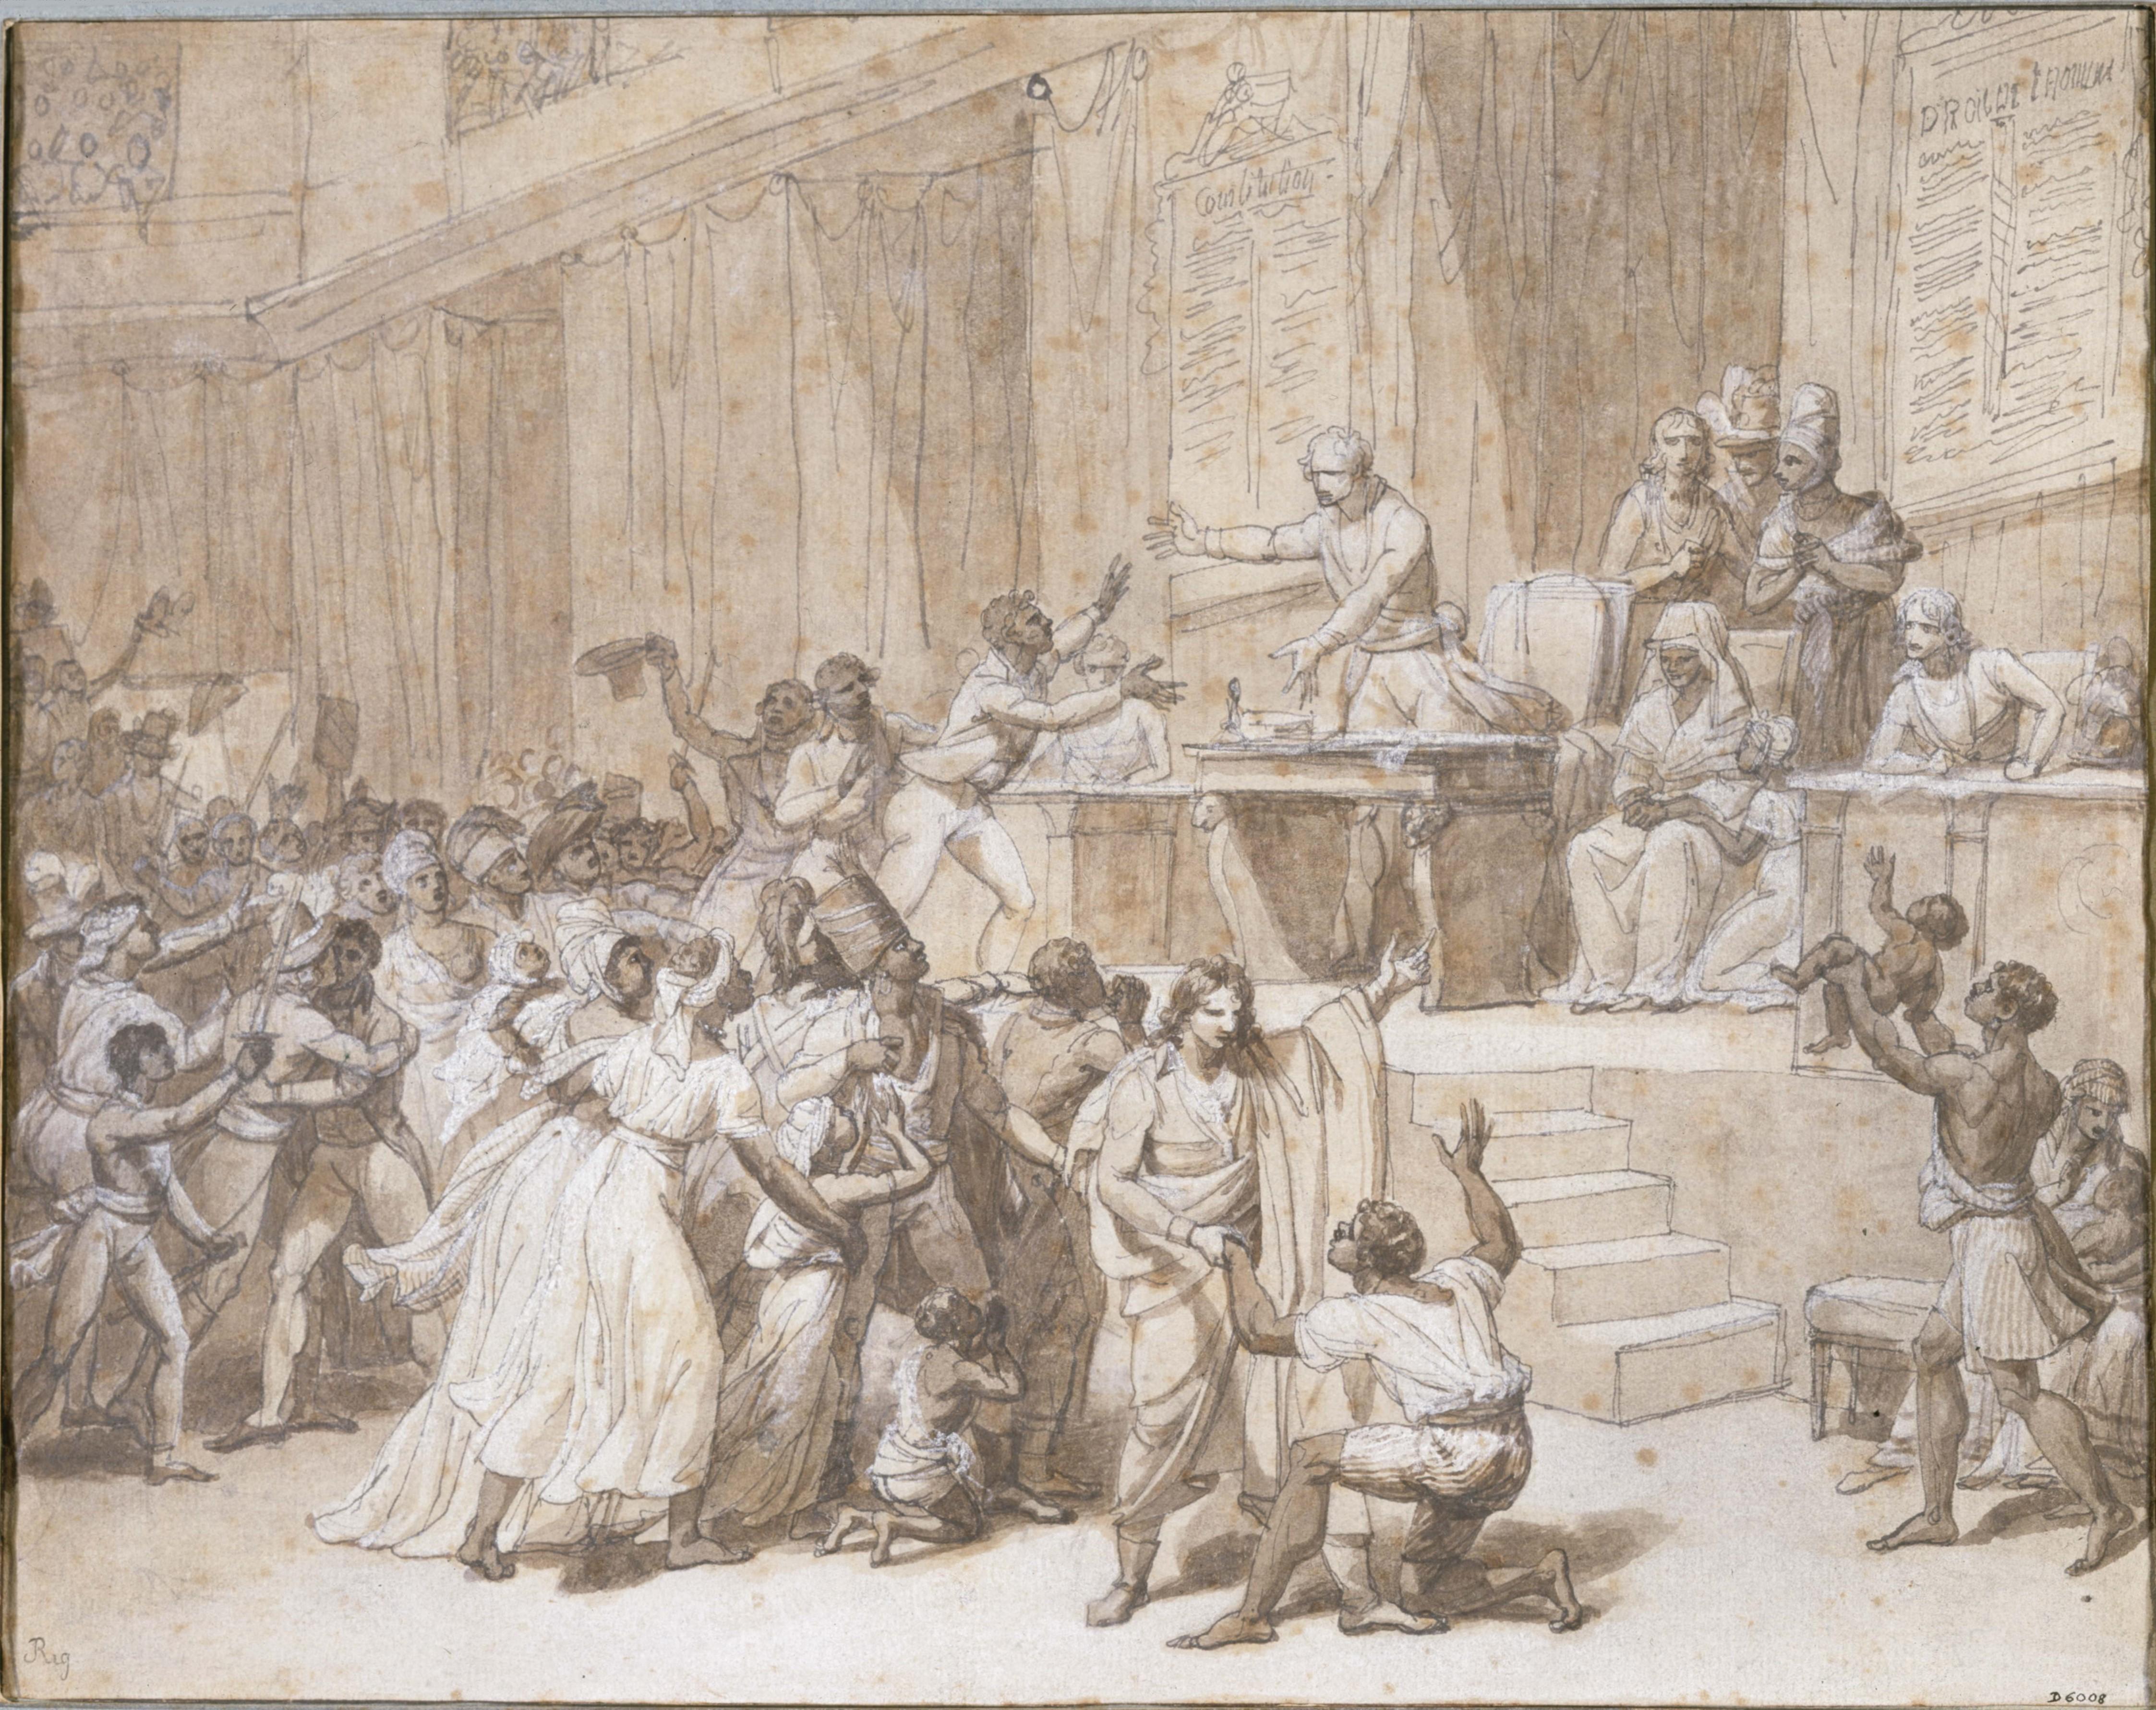 http://upload.wikimedia.org/wikipedia/commons/c/c8/L%27insurrection_des_esclaves_entre_dans_la_Convention._Jeanne_Odo_%C3%A0_la_tribune.jpg